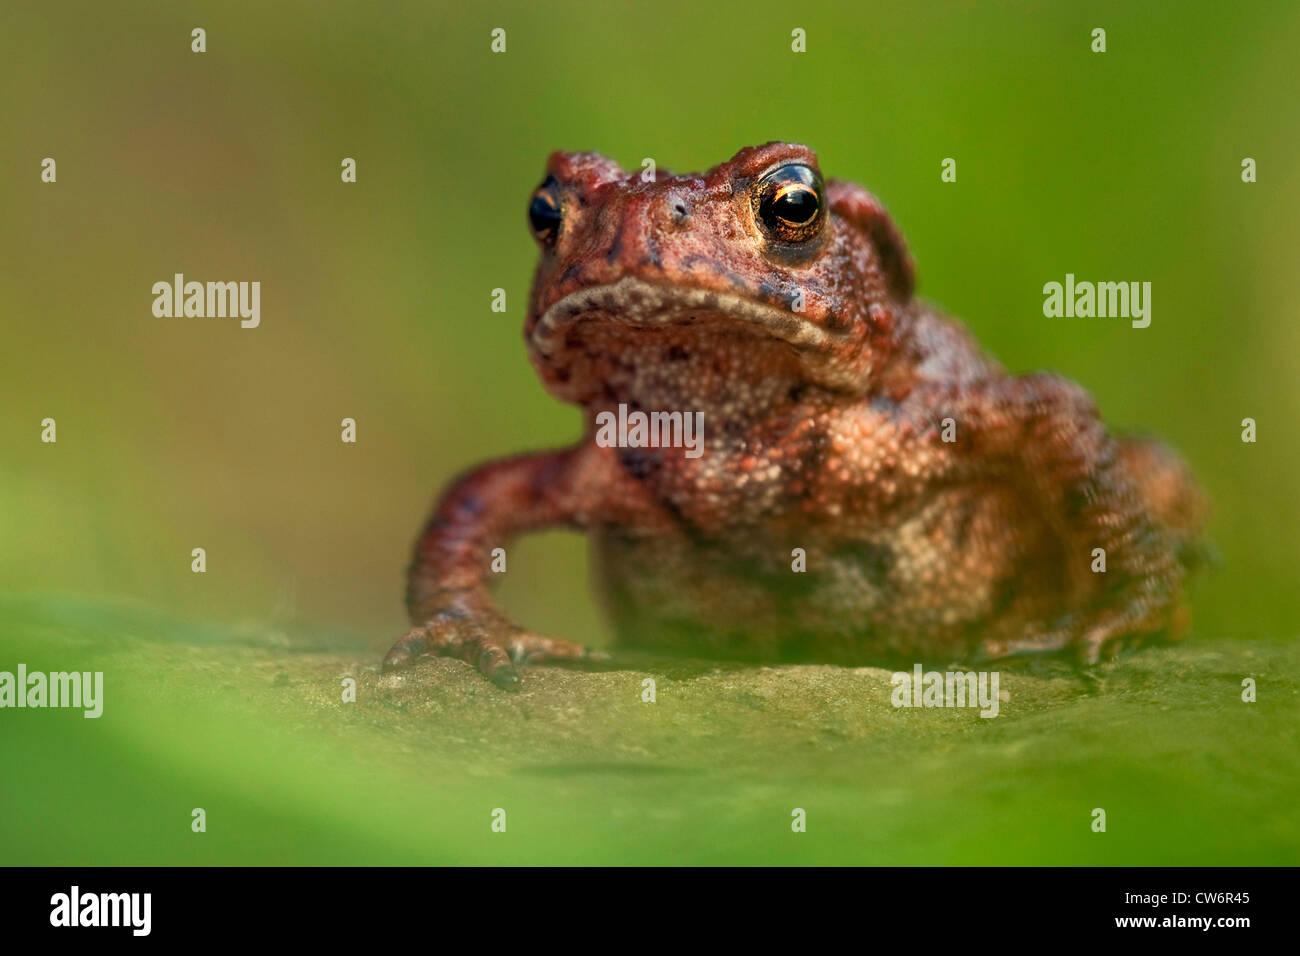 European common toad (Bufo bufo), sitting on the ground, Germany, Rhineland-Palatinate Stock Photo